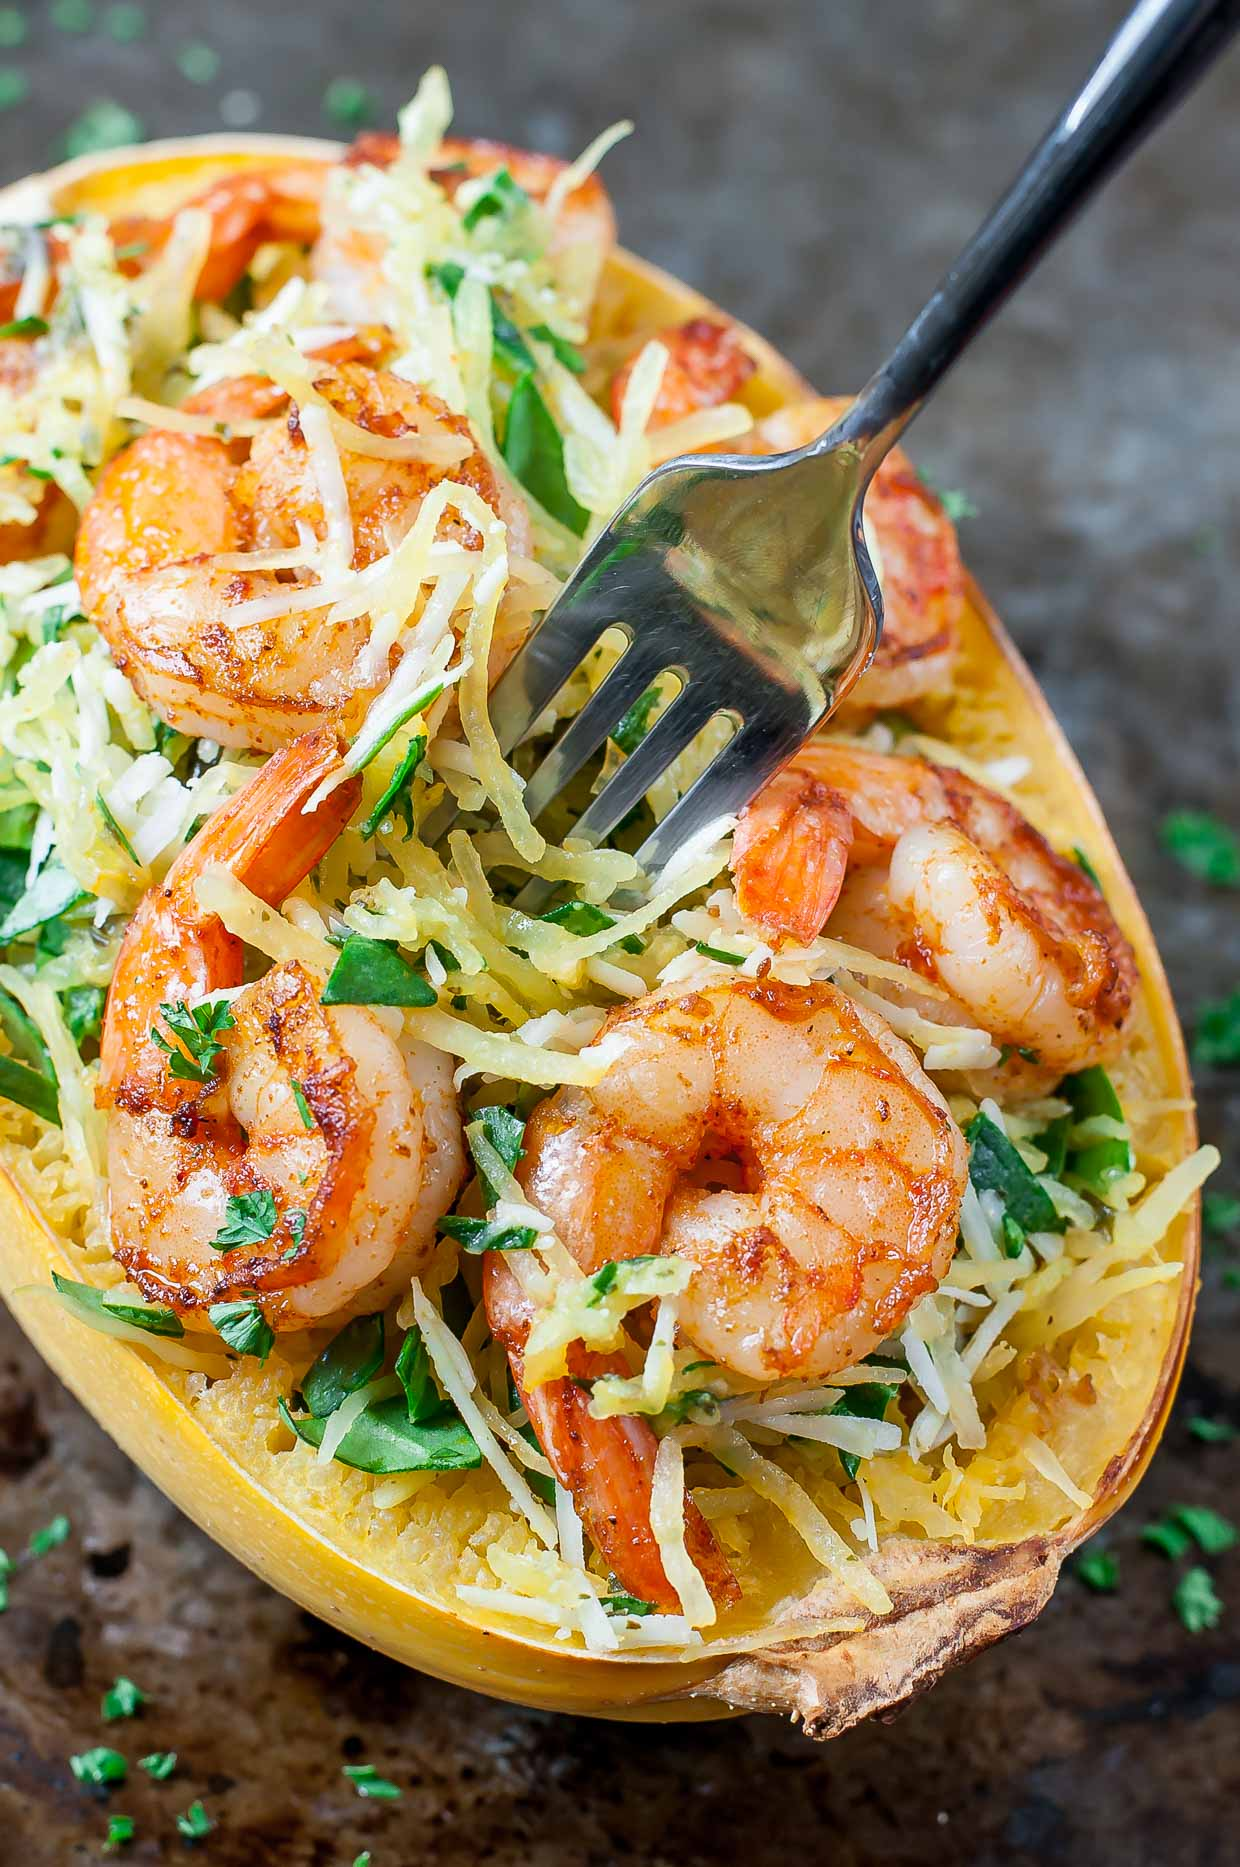 spaghetti squash shrimp pesto parmesan recipe dinner recipes delicious peasandcrayons spinach serve peas tender